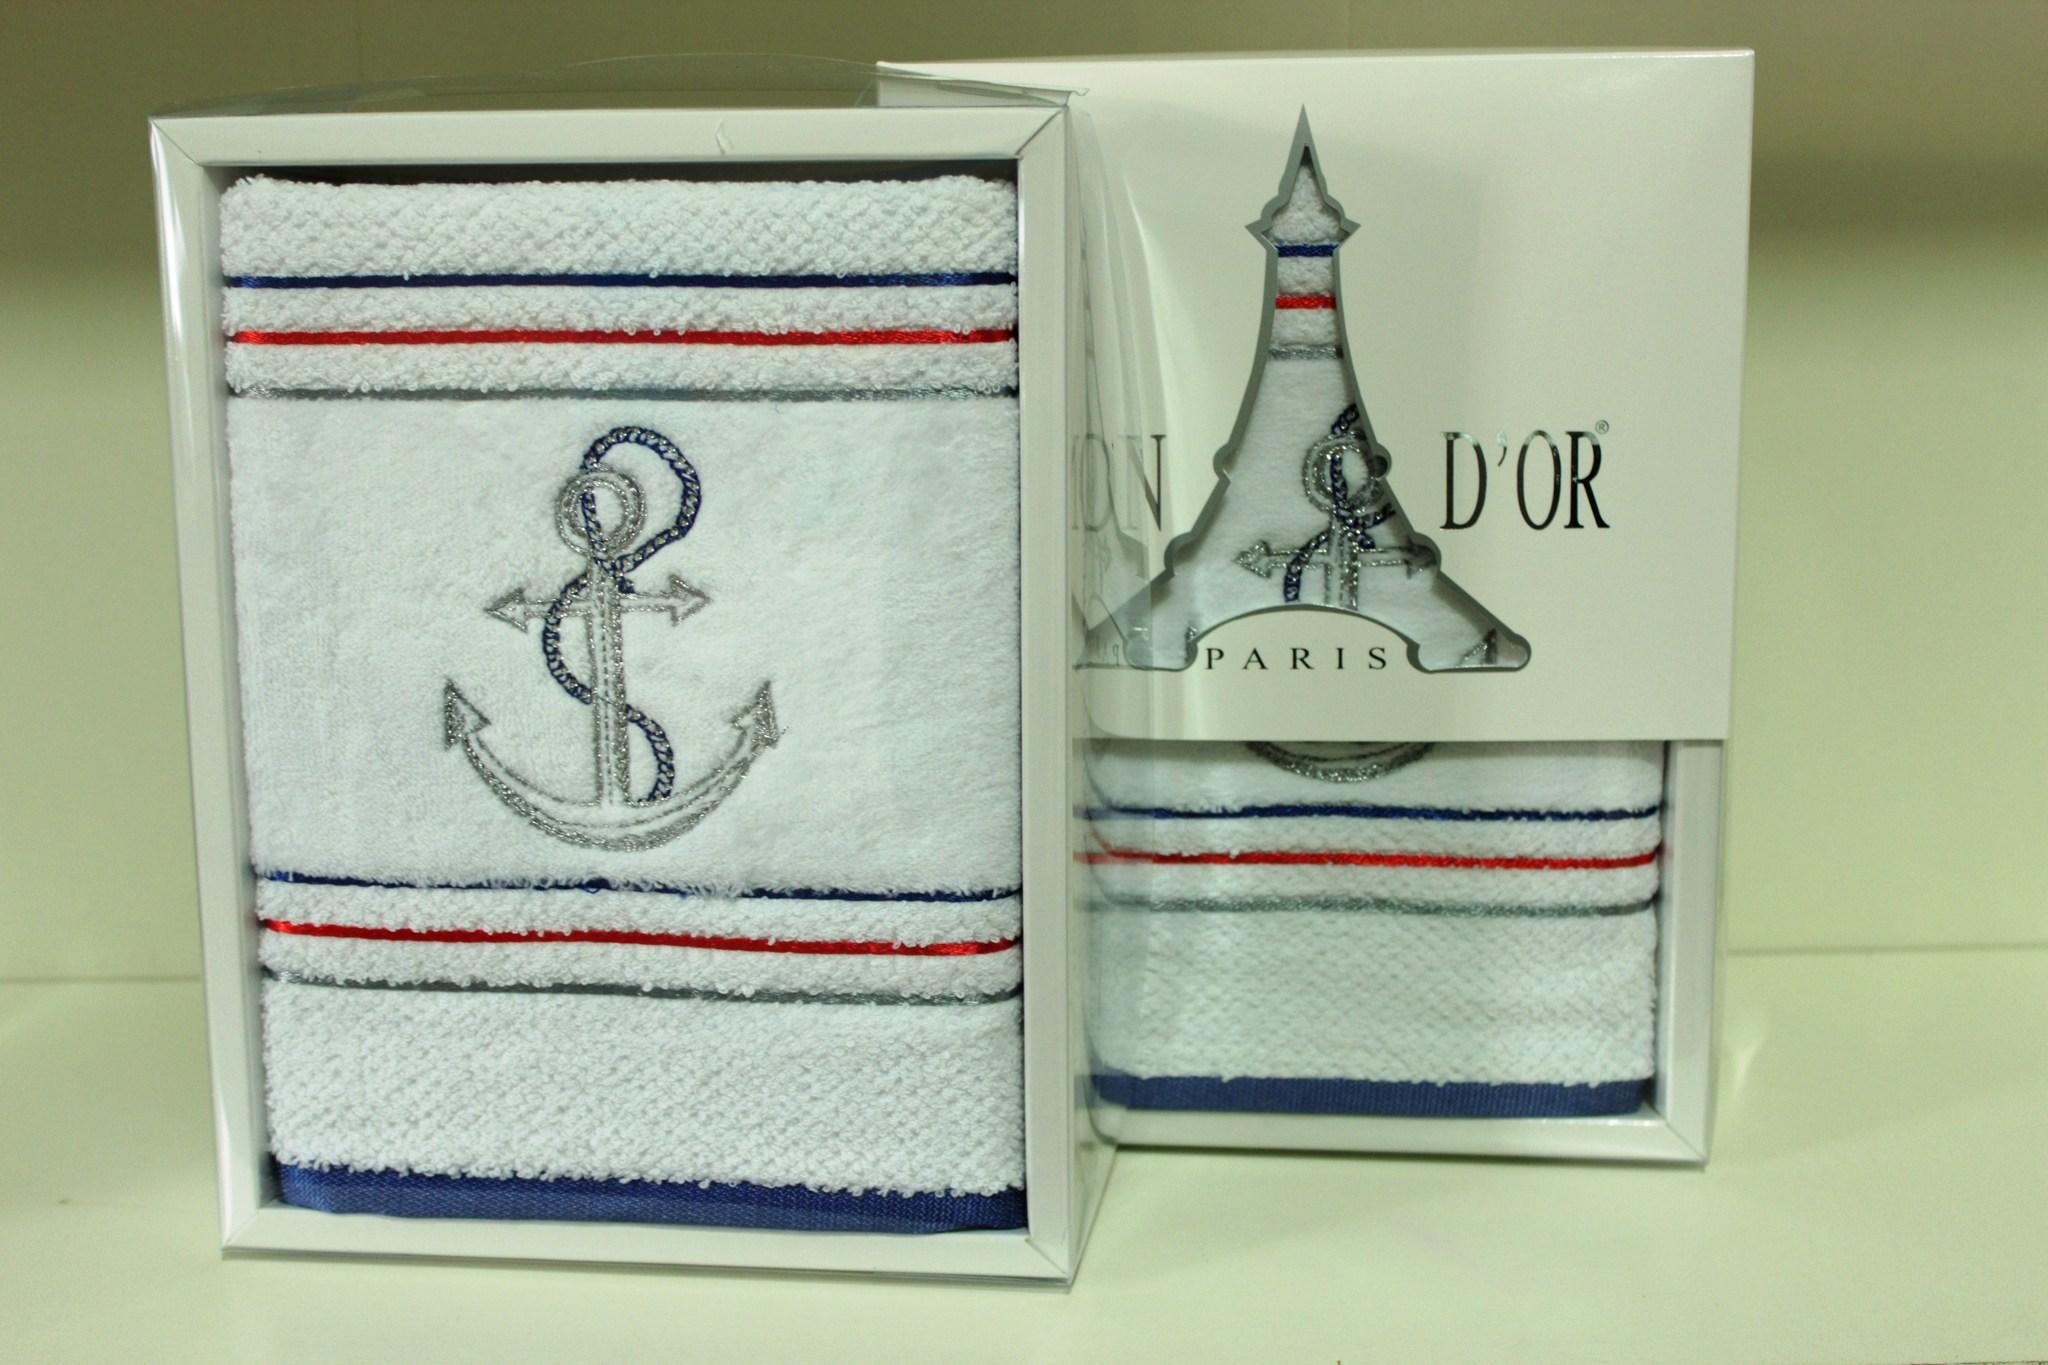 Полотенца MARINE  МАРИНЕ полотенце махровое в коробке Maison Dor Турция MARINE.JPG